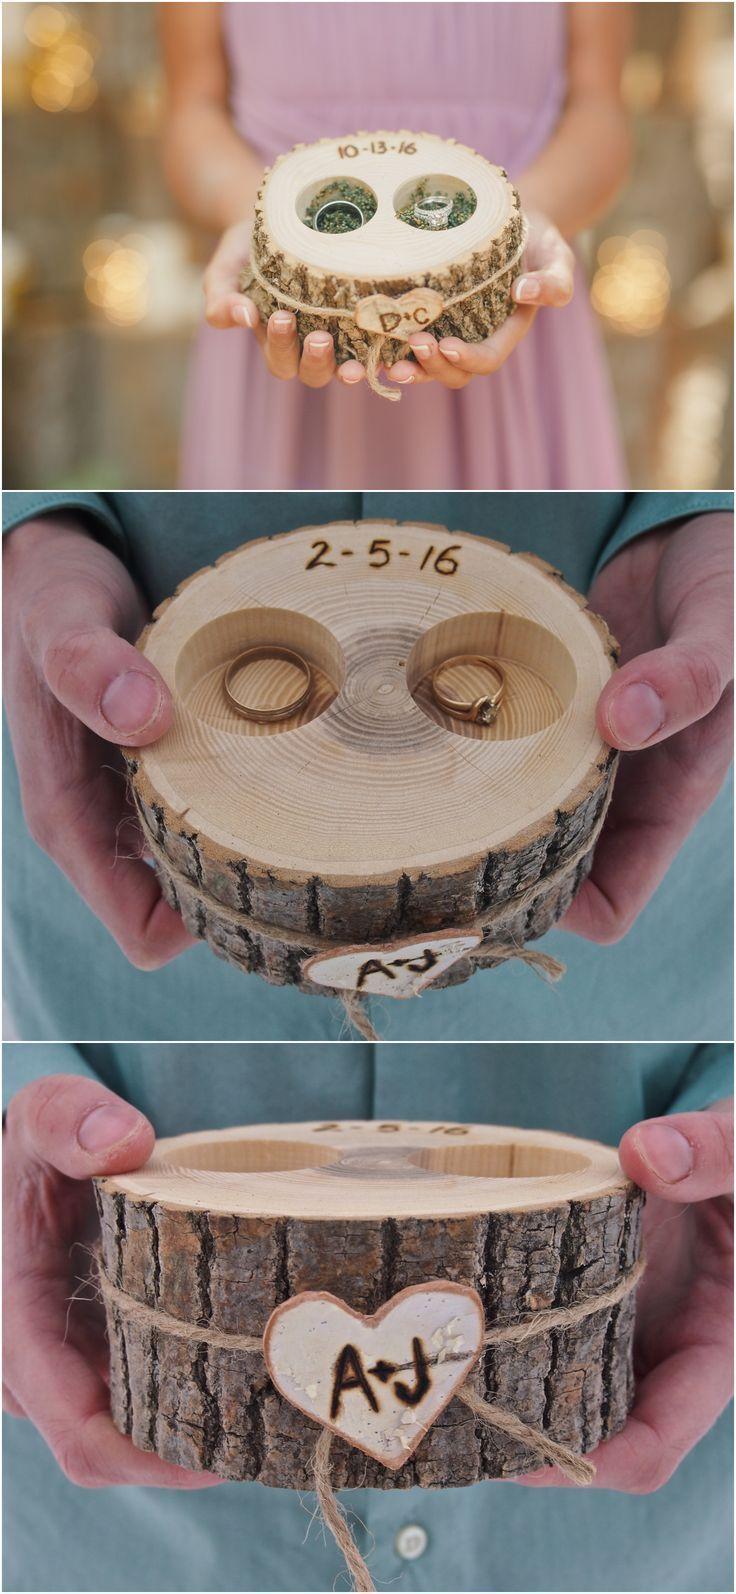 Ring Bearer Box, Ring Box, Ring Bearer Pillow, Personalized Wood Ring Holder, Wood Slice, Ring Pillow Alternative